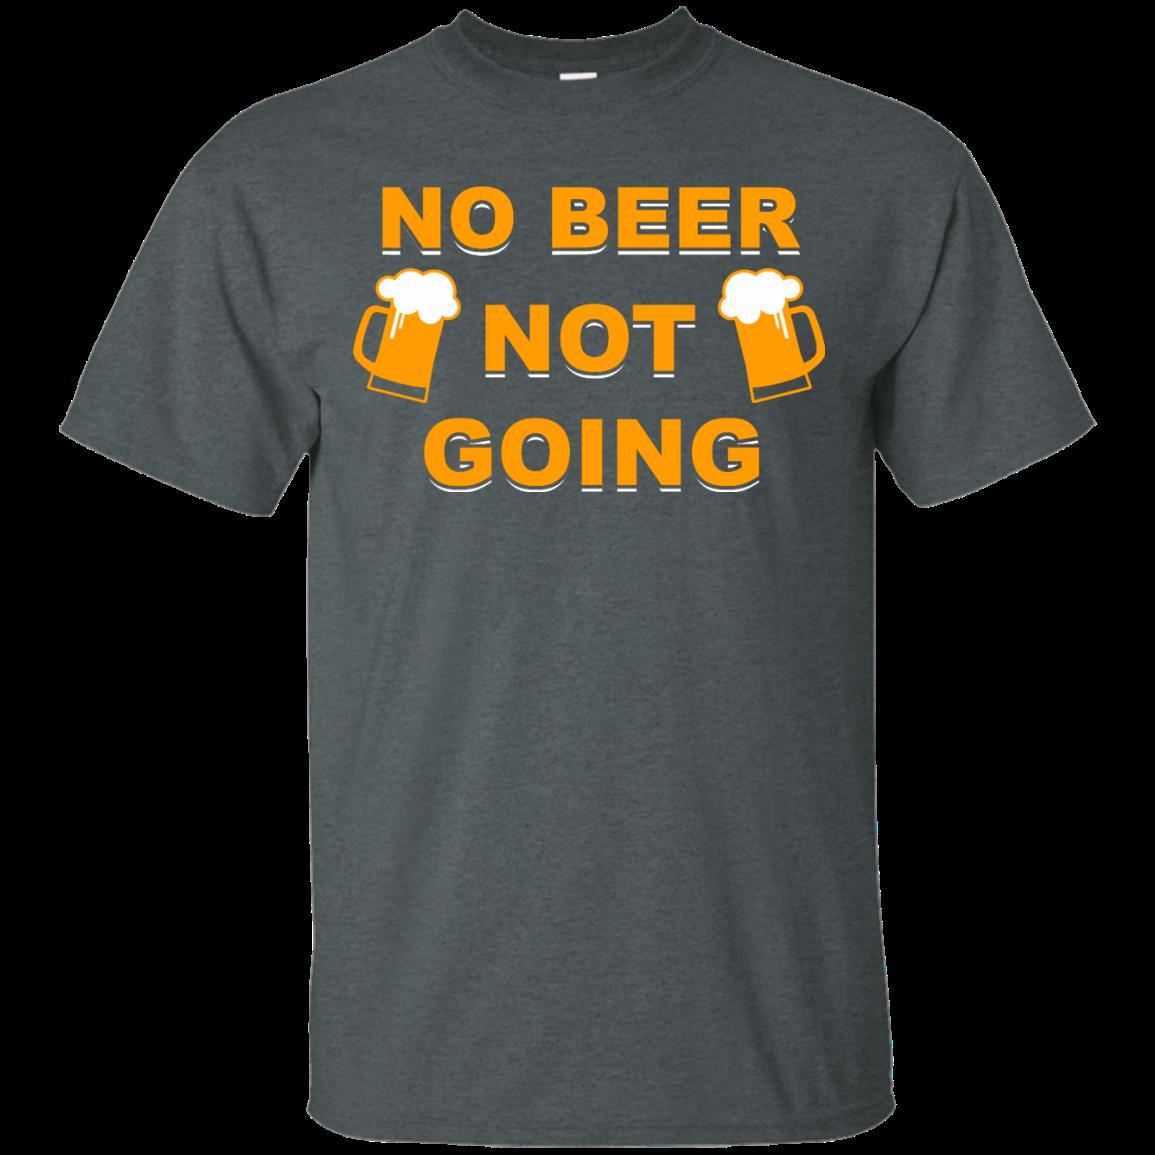 No beer not going T shirt, I love drinking beer T shirt,Tank top & Hoodies